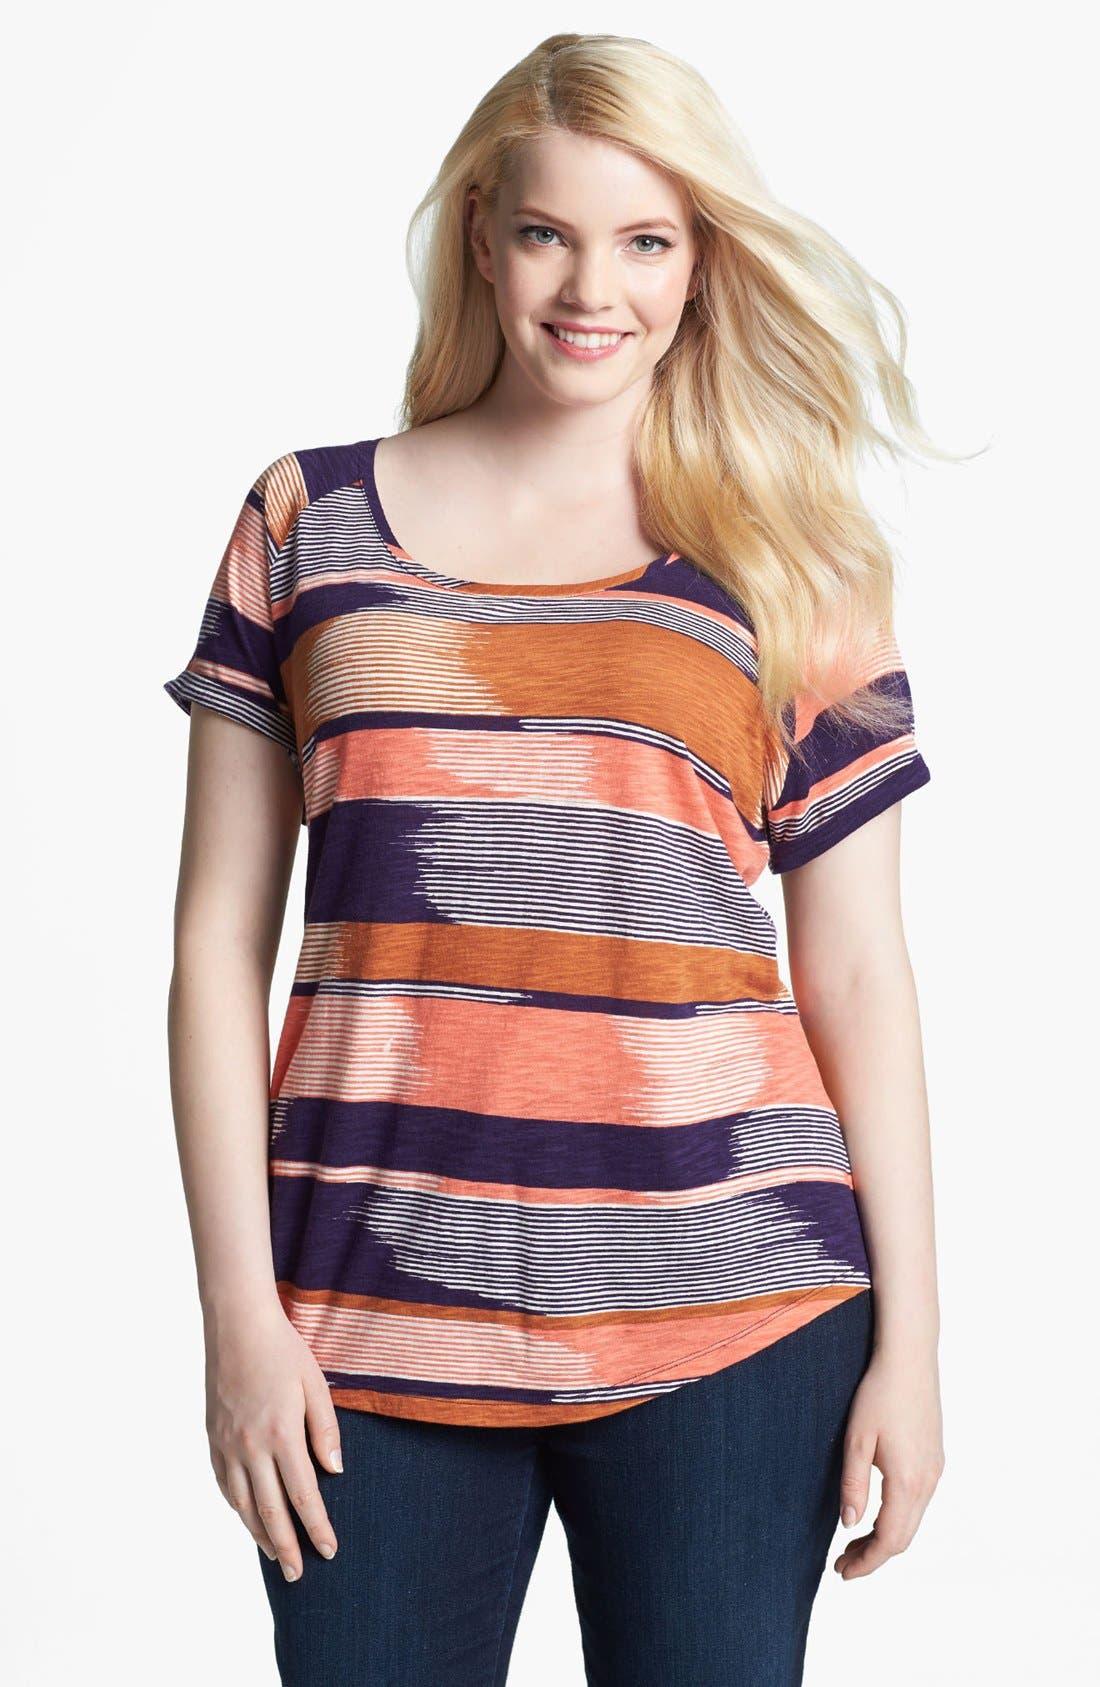 Alternate Image 1 Selected - Lucky Brand 'Alina' Stripe Tee (Plus)